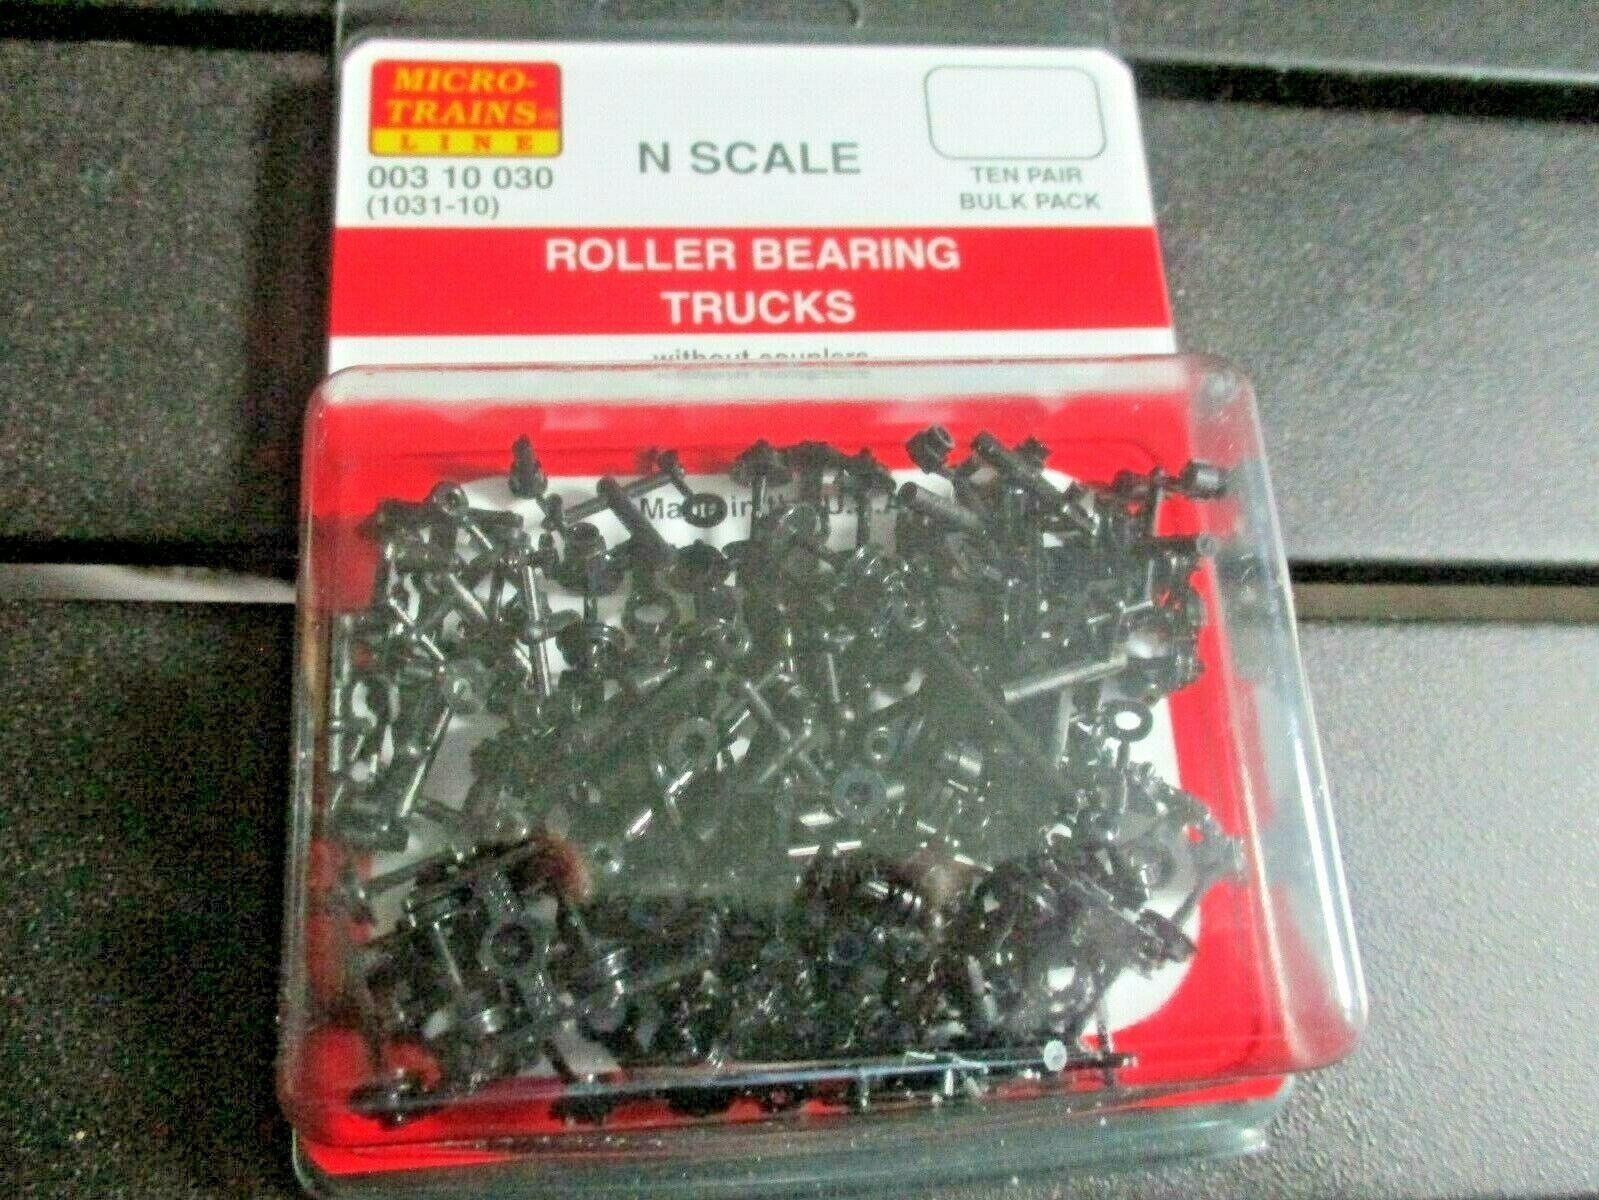 Micro-Trains Stock # 00310030 (1031-10) Roller Bearing Trucks w/o Couplers 10 PR